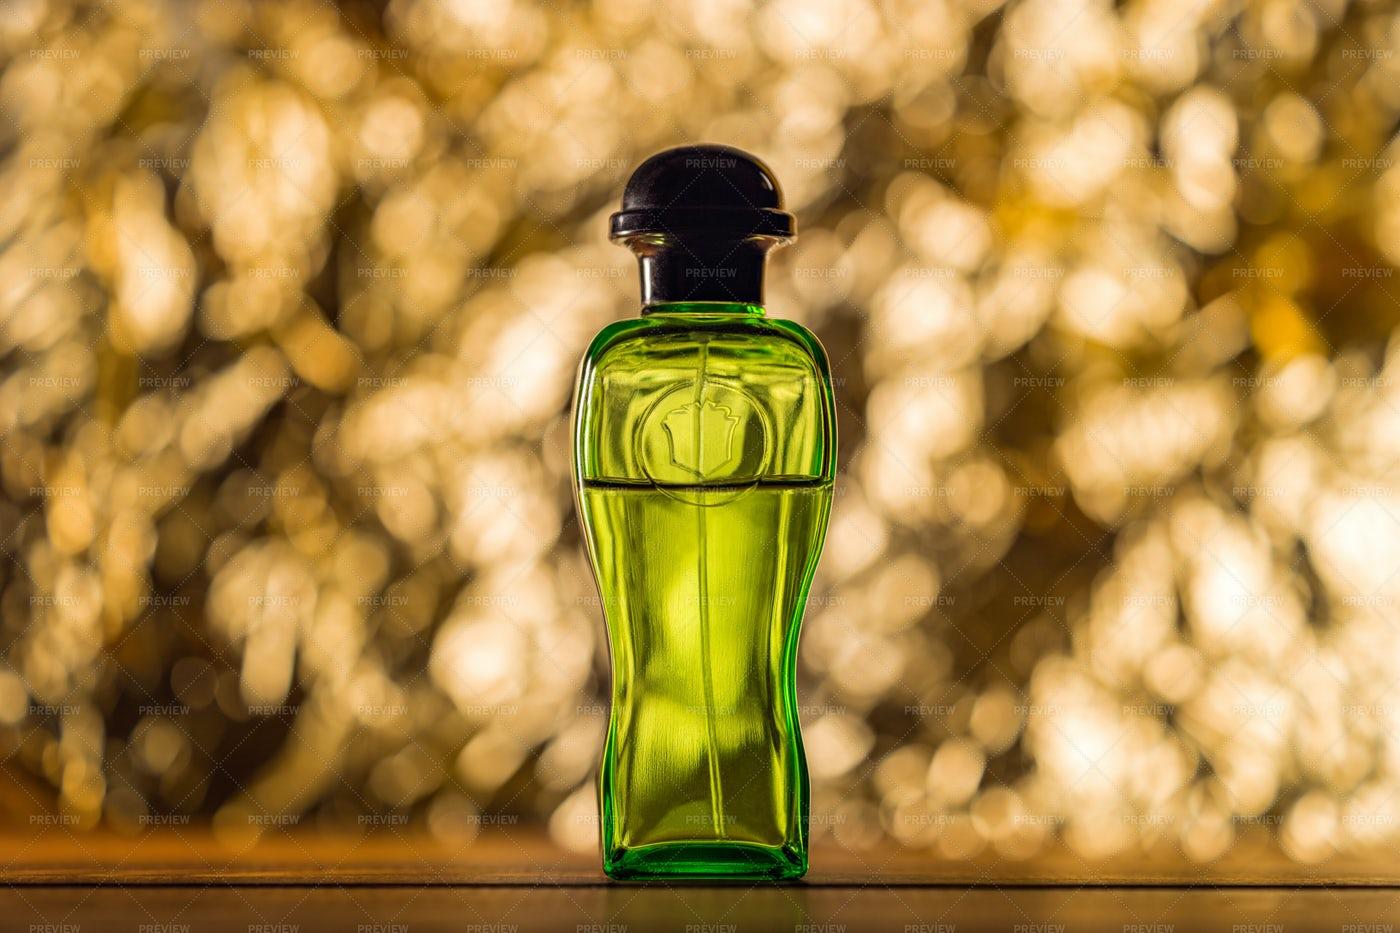 Bottle Of Fragrance Perfume: Stock Photos